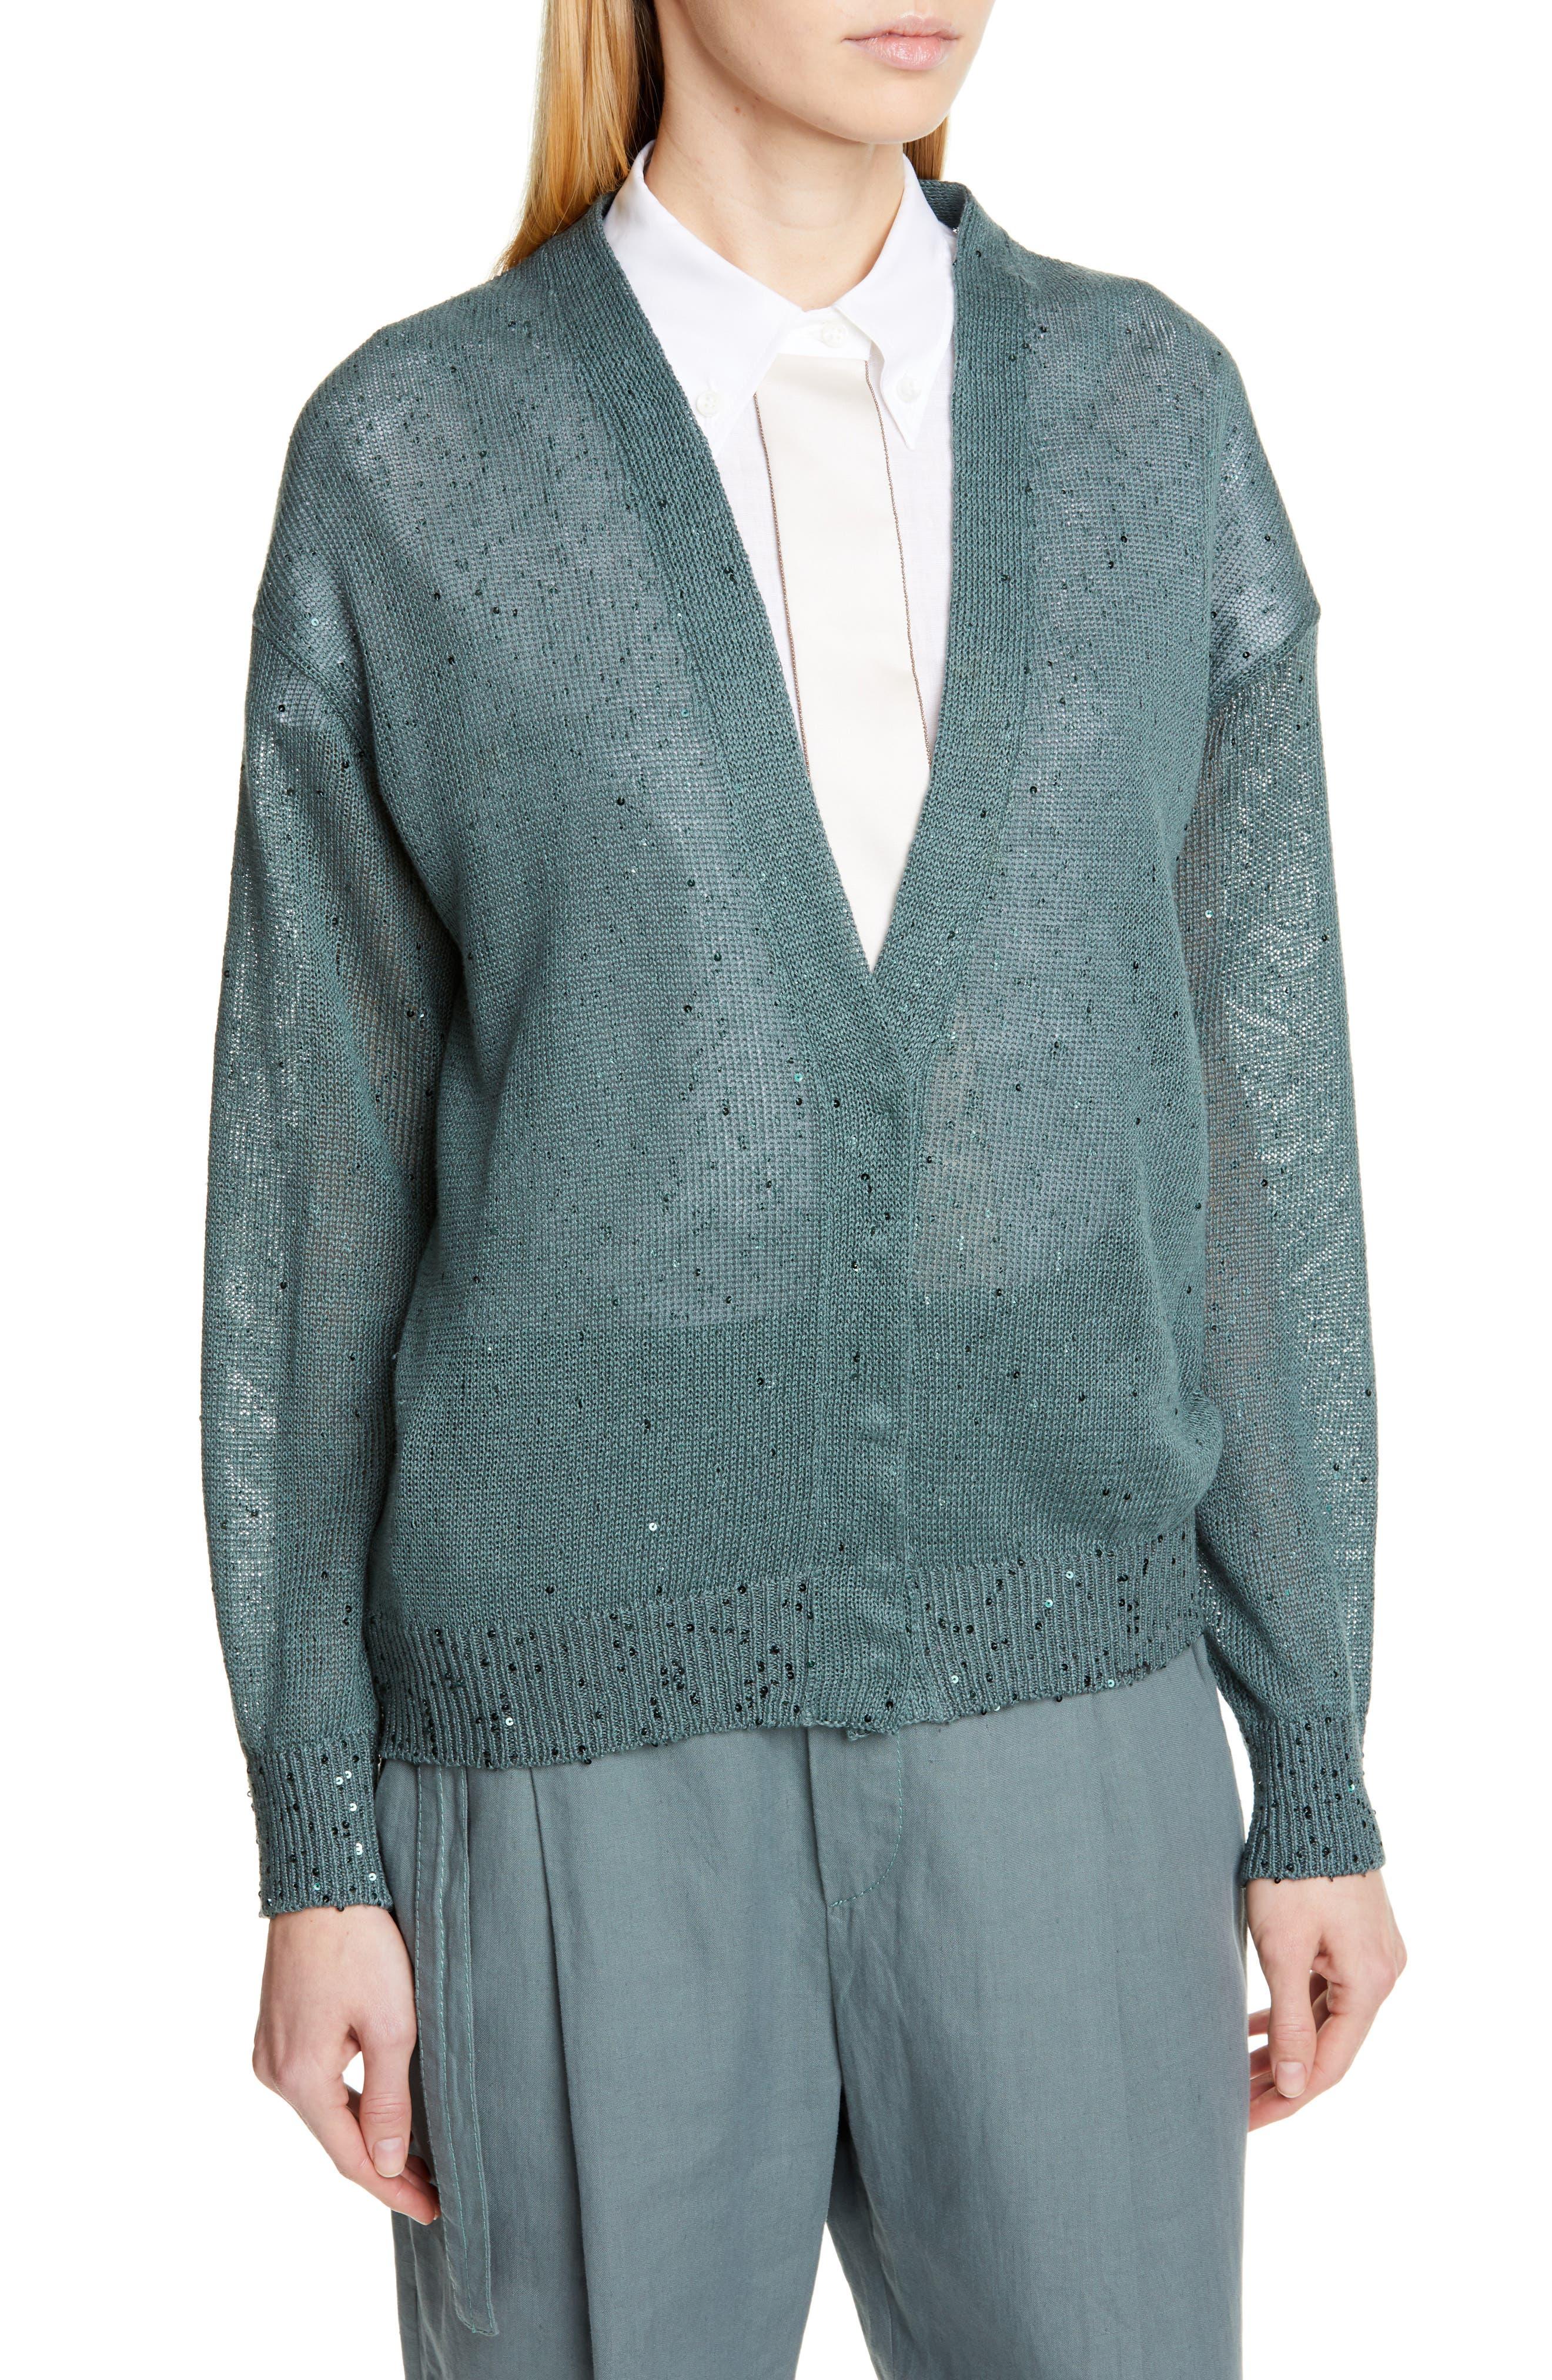 BRUNELLO CUCINELLI, Sequin Linen & Silk Cardigan, Alternate thumbnail 4, color, SAGE